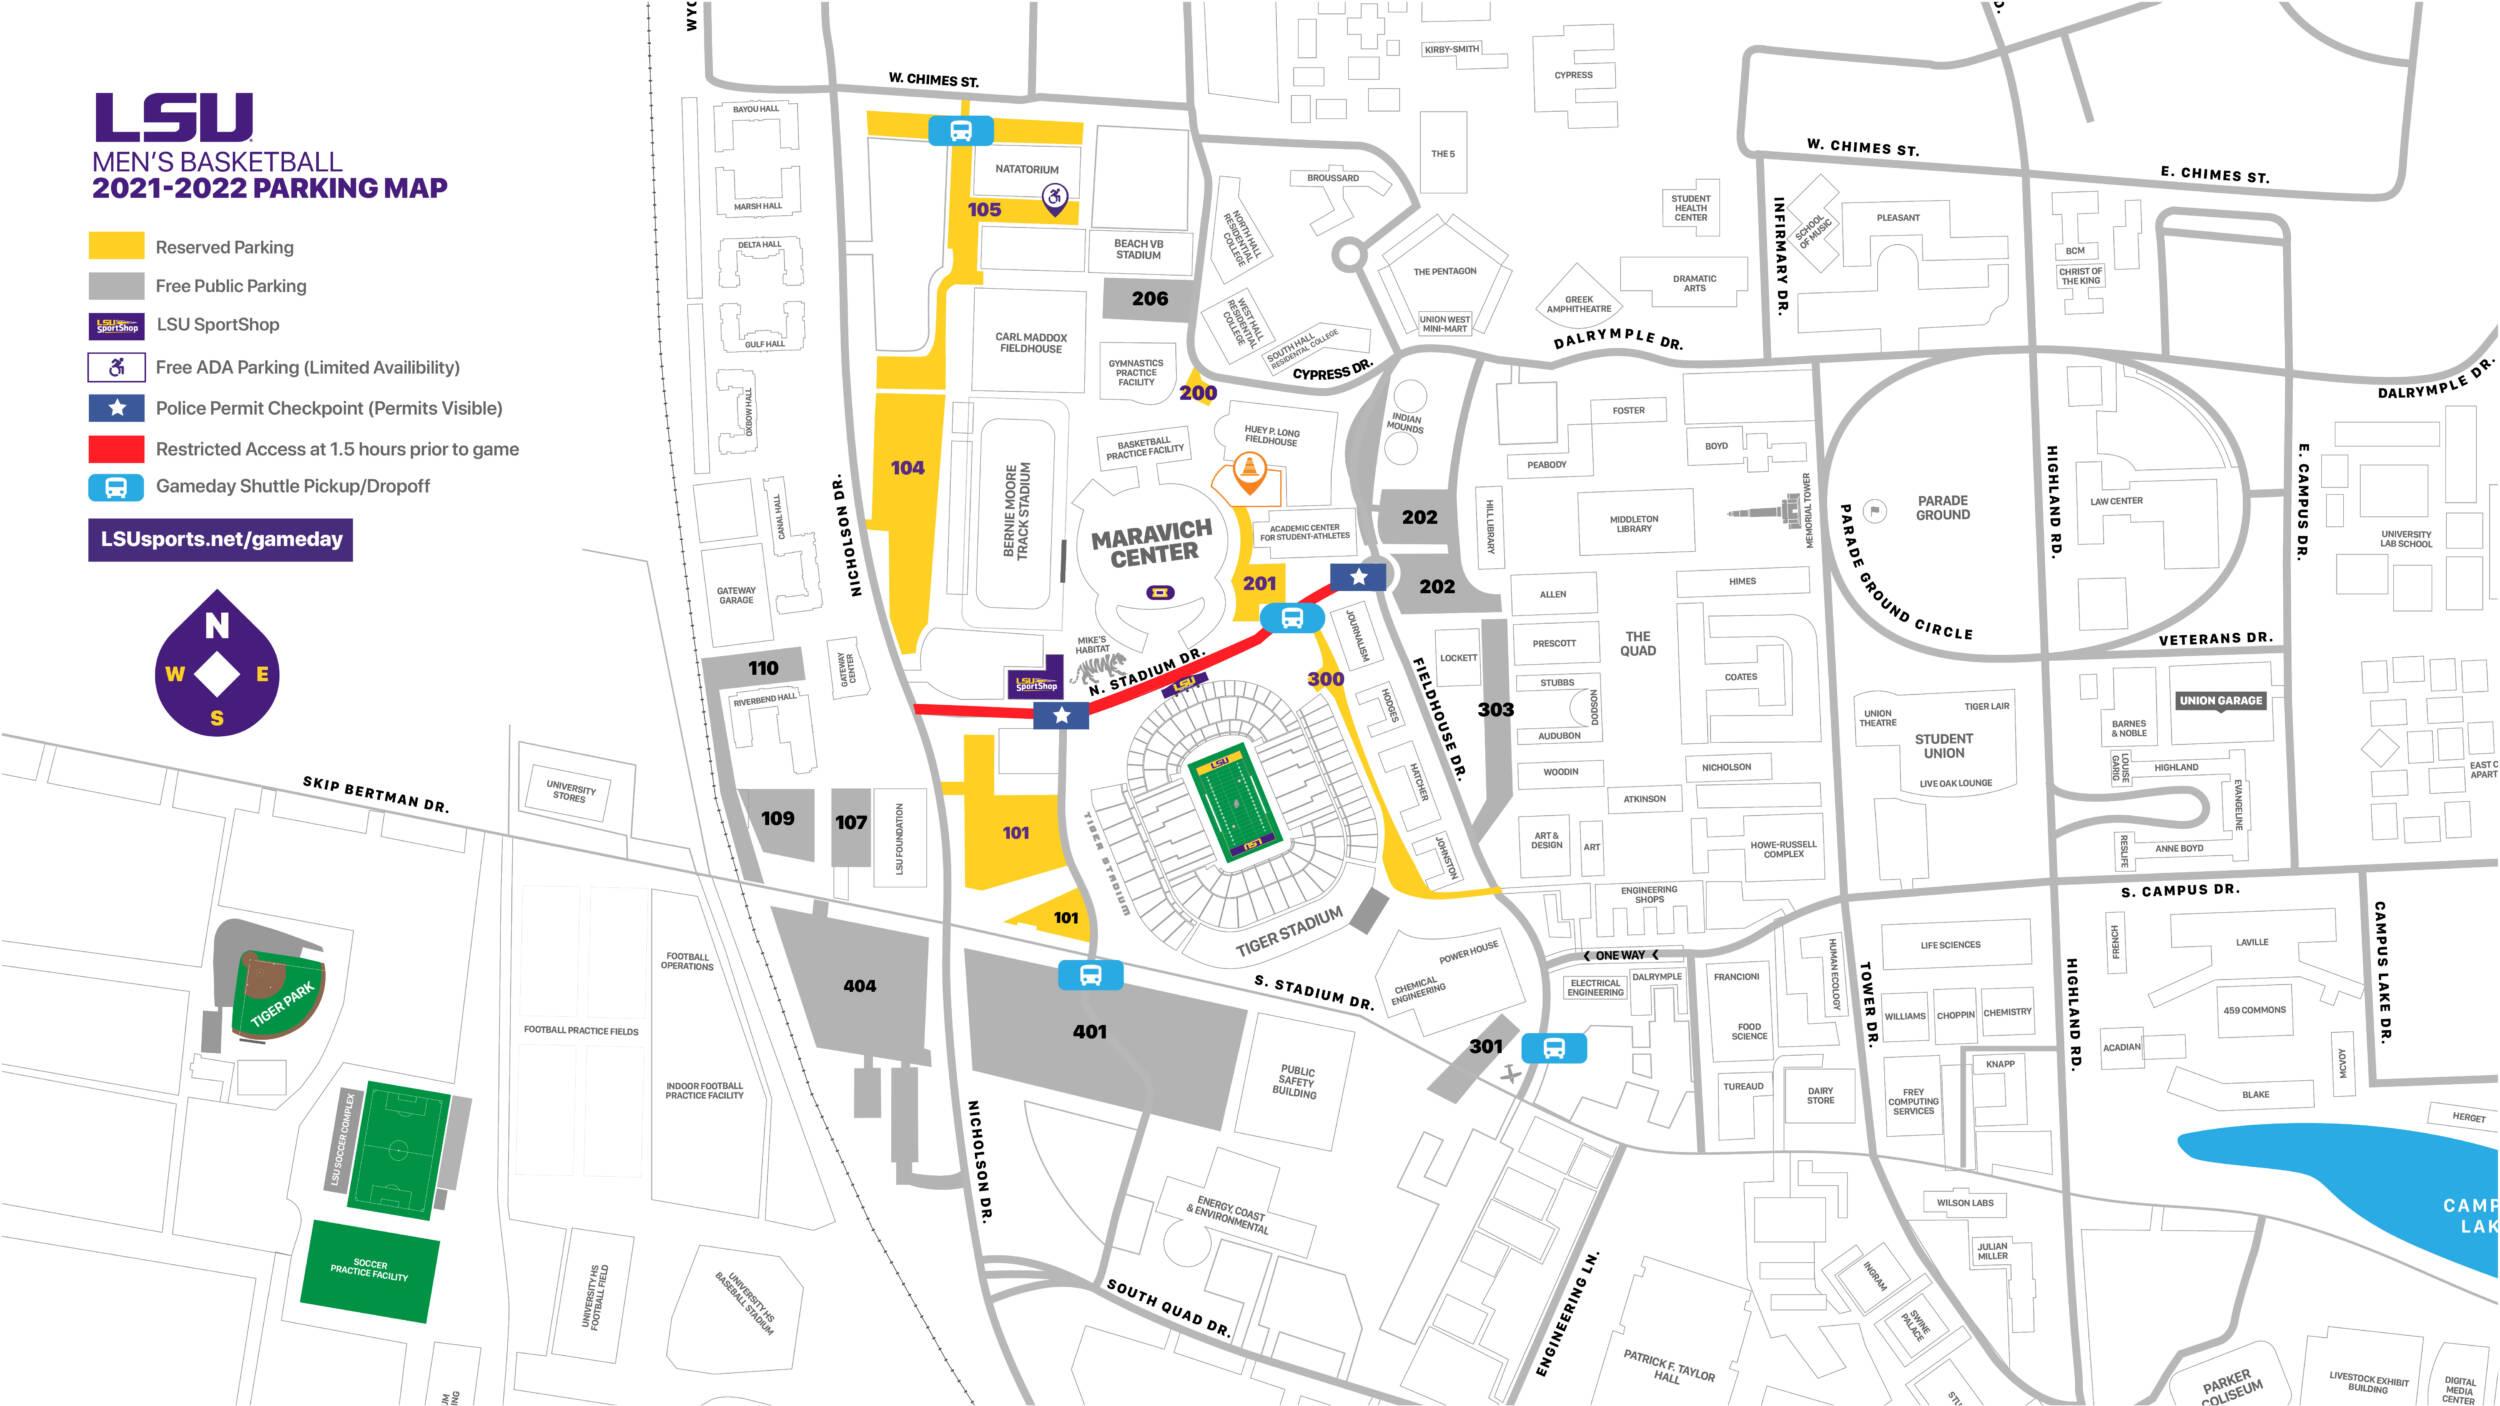 LSU Men's Basketball Parking Map